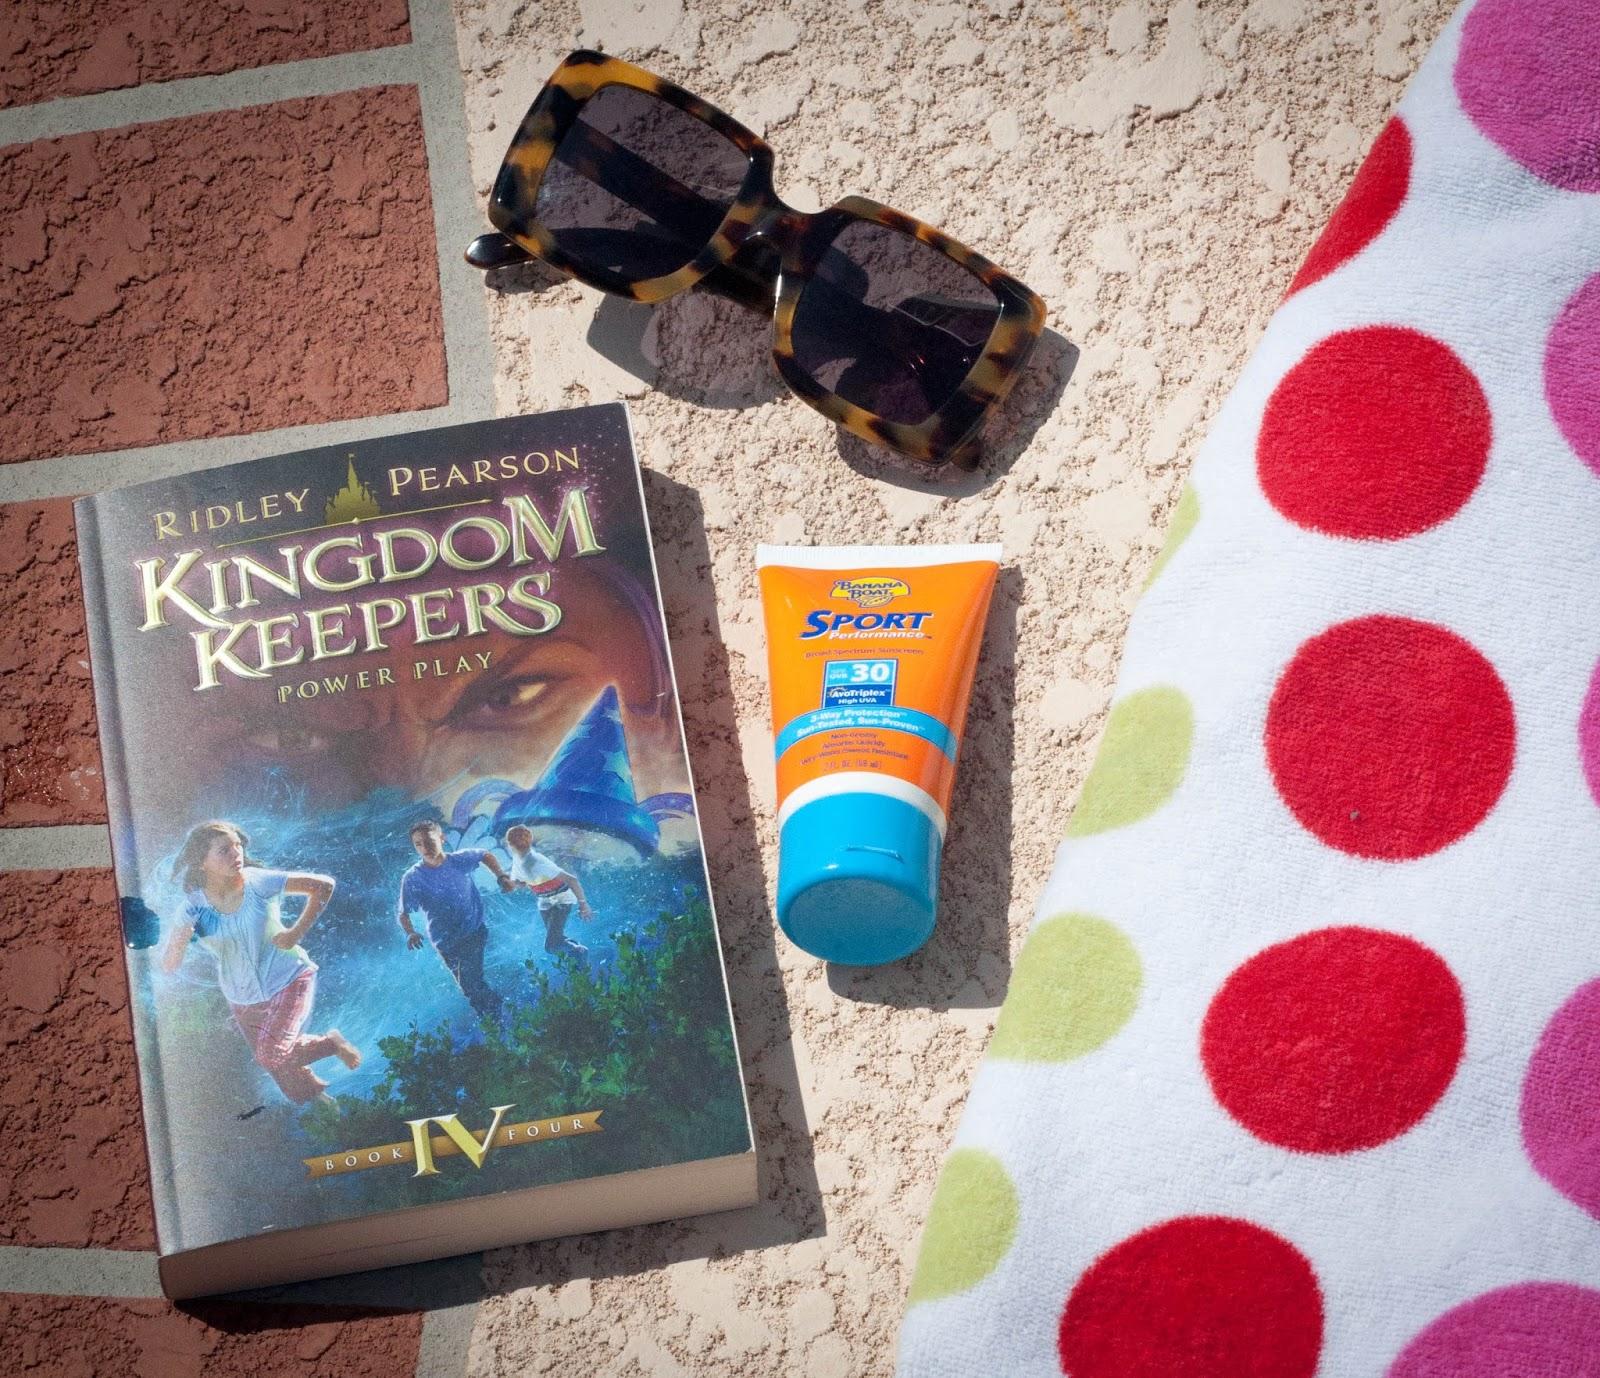 kingdom keepers, ridley pearson, teenage book series, sunscreen, karen walker, karen walker betsy, karen walker sunglasses, polka beach towel